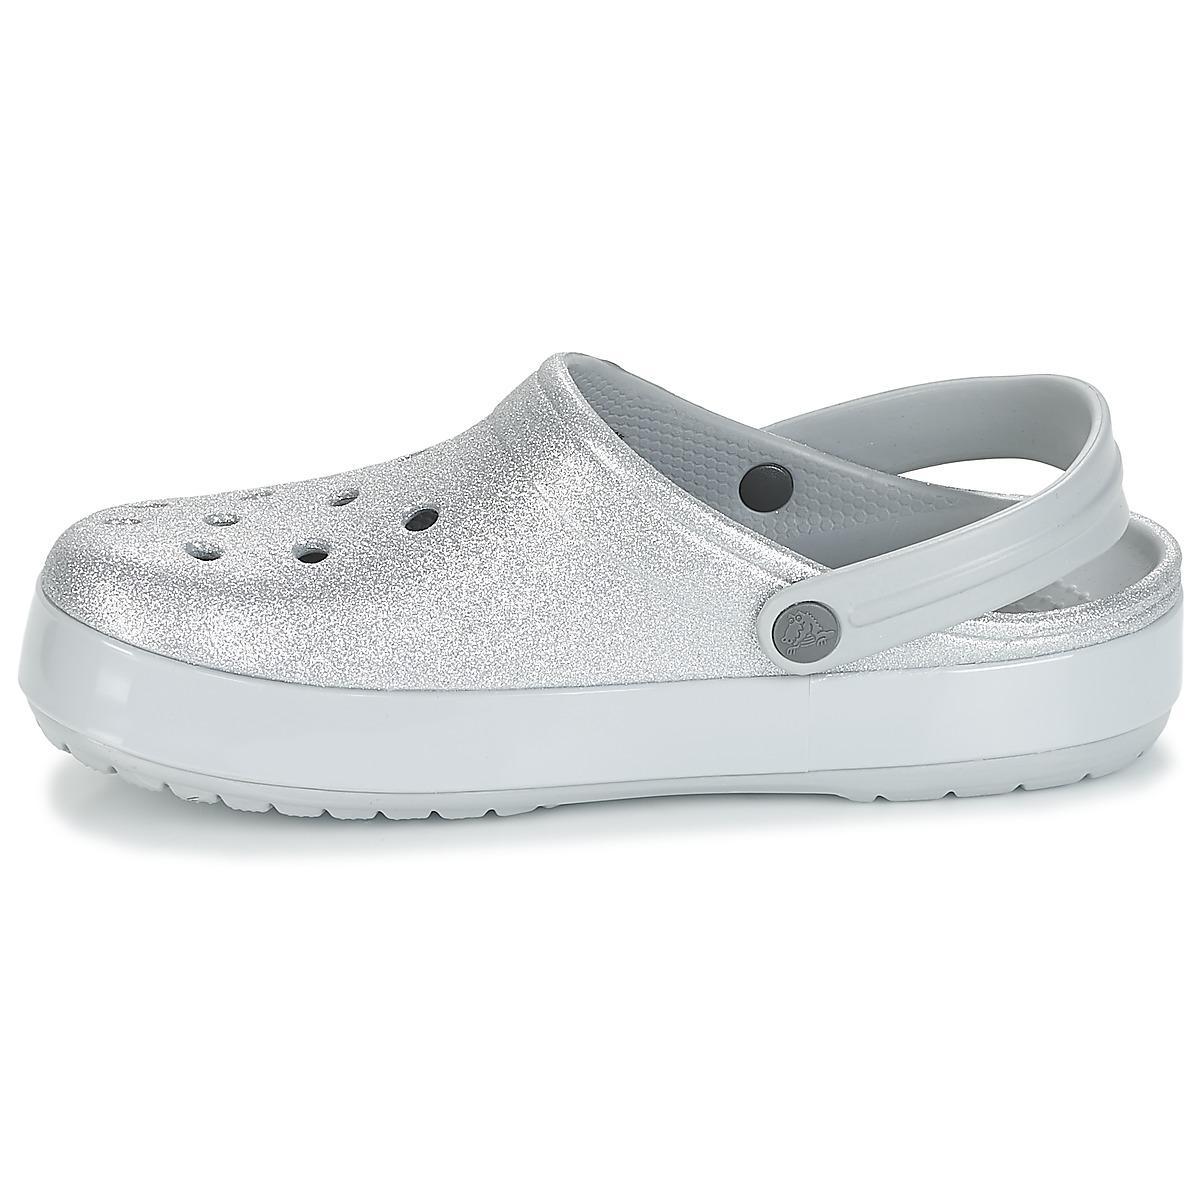 Crocs™ Crocband Glitter Clog Clogs (shoes) in Silver (Metallic) - Lyst